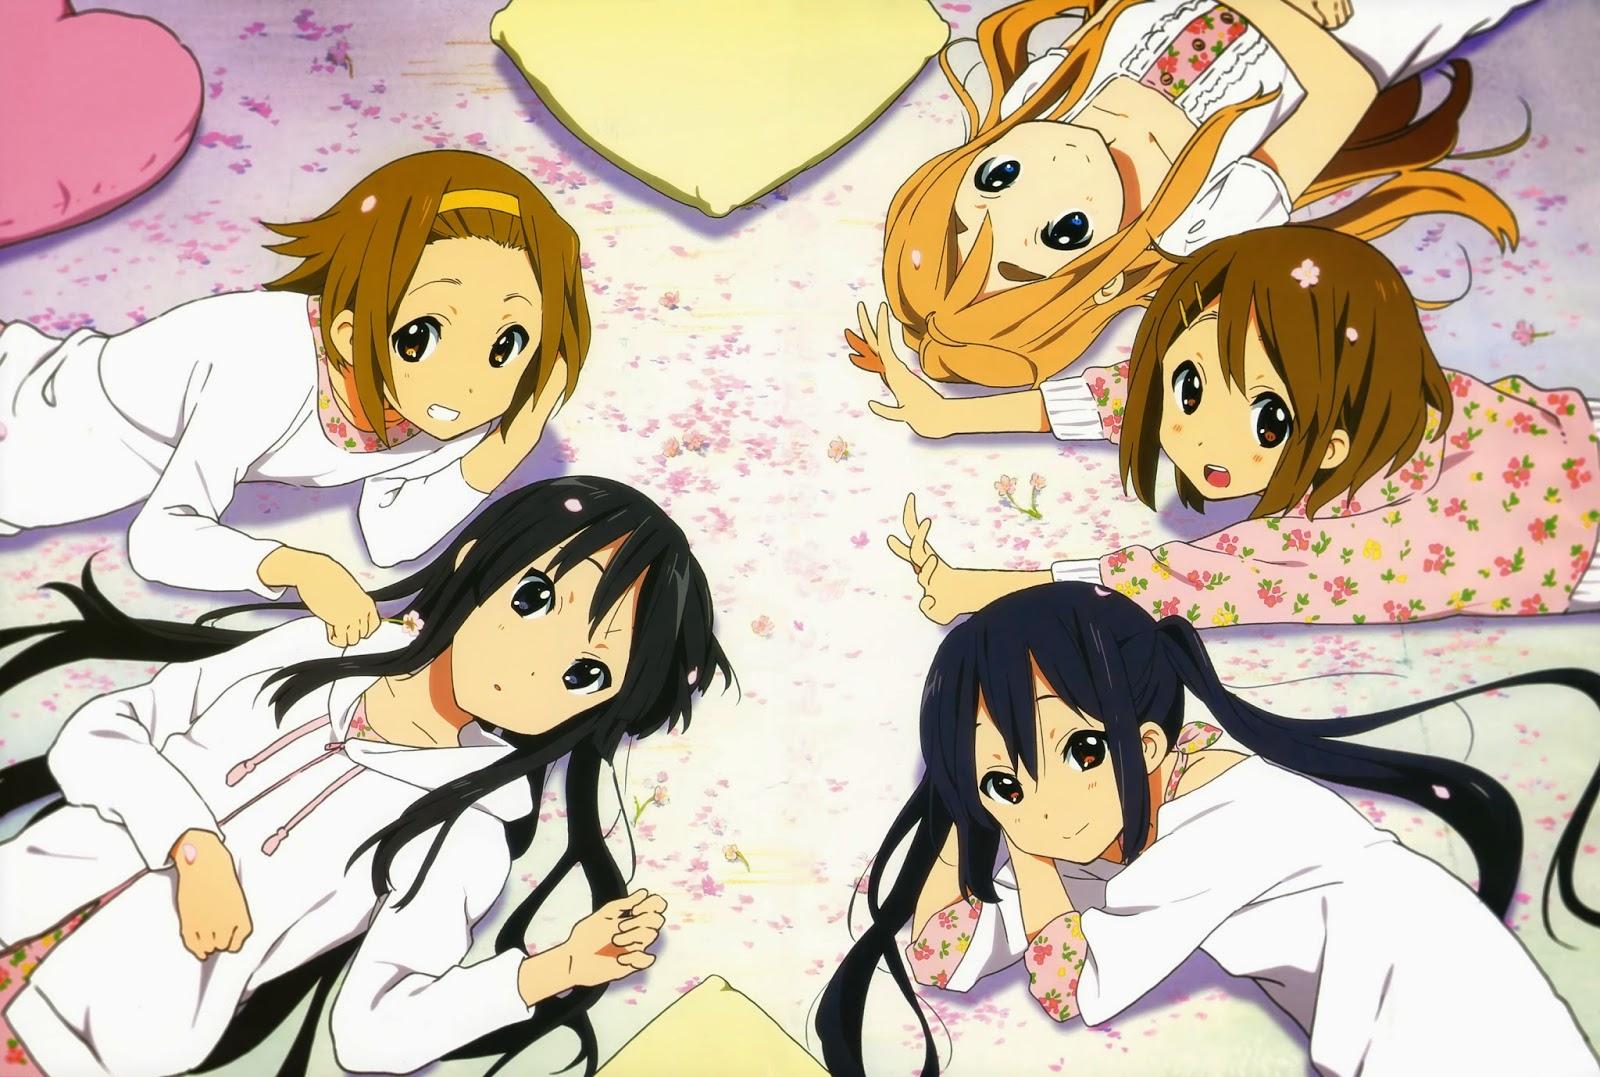 Anime Lucu Keren Ktawaayo Ketawa